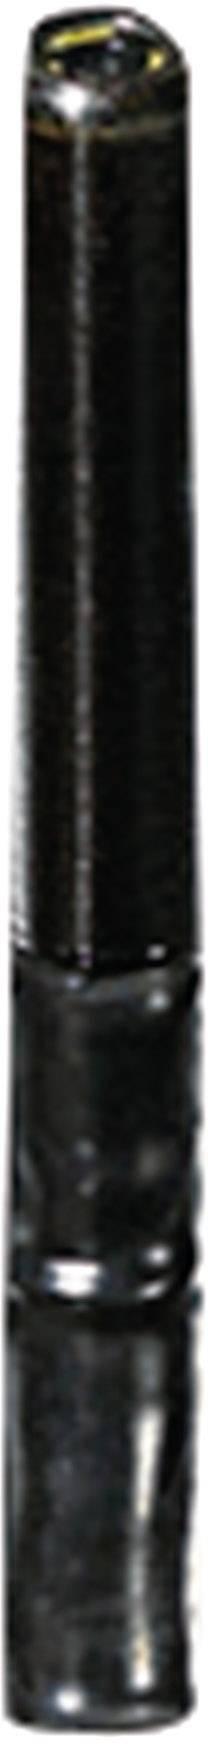 Sonda s kamerou 4WAY FA8100C pre endoskopy Voltcraft BS-500, BS-1000T, Ø 7.5 mm, 1 m